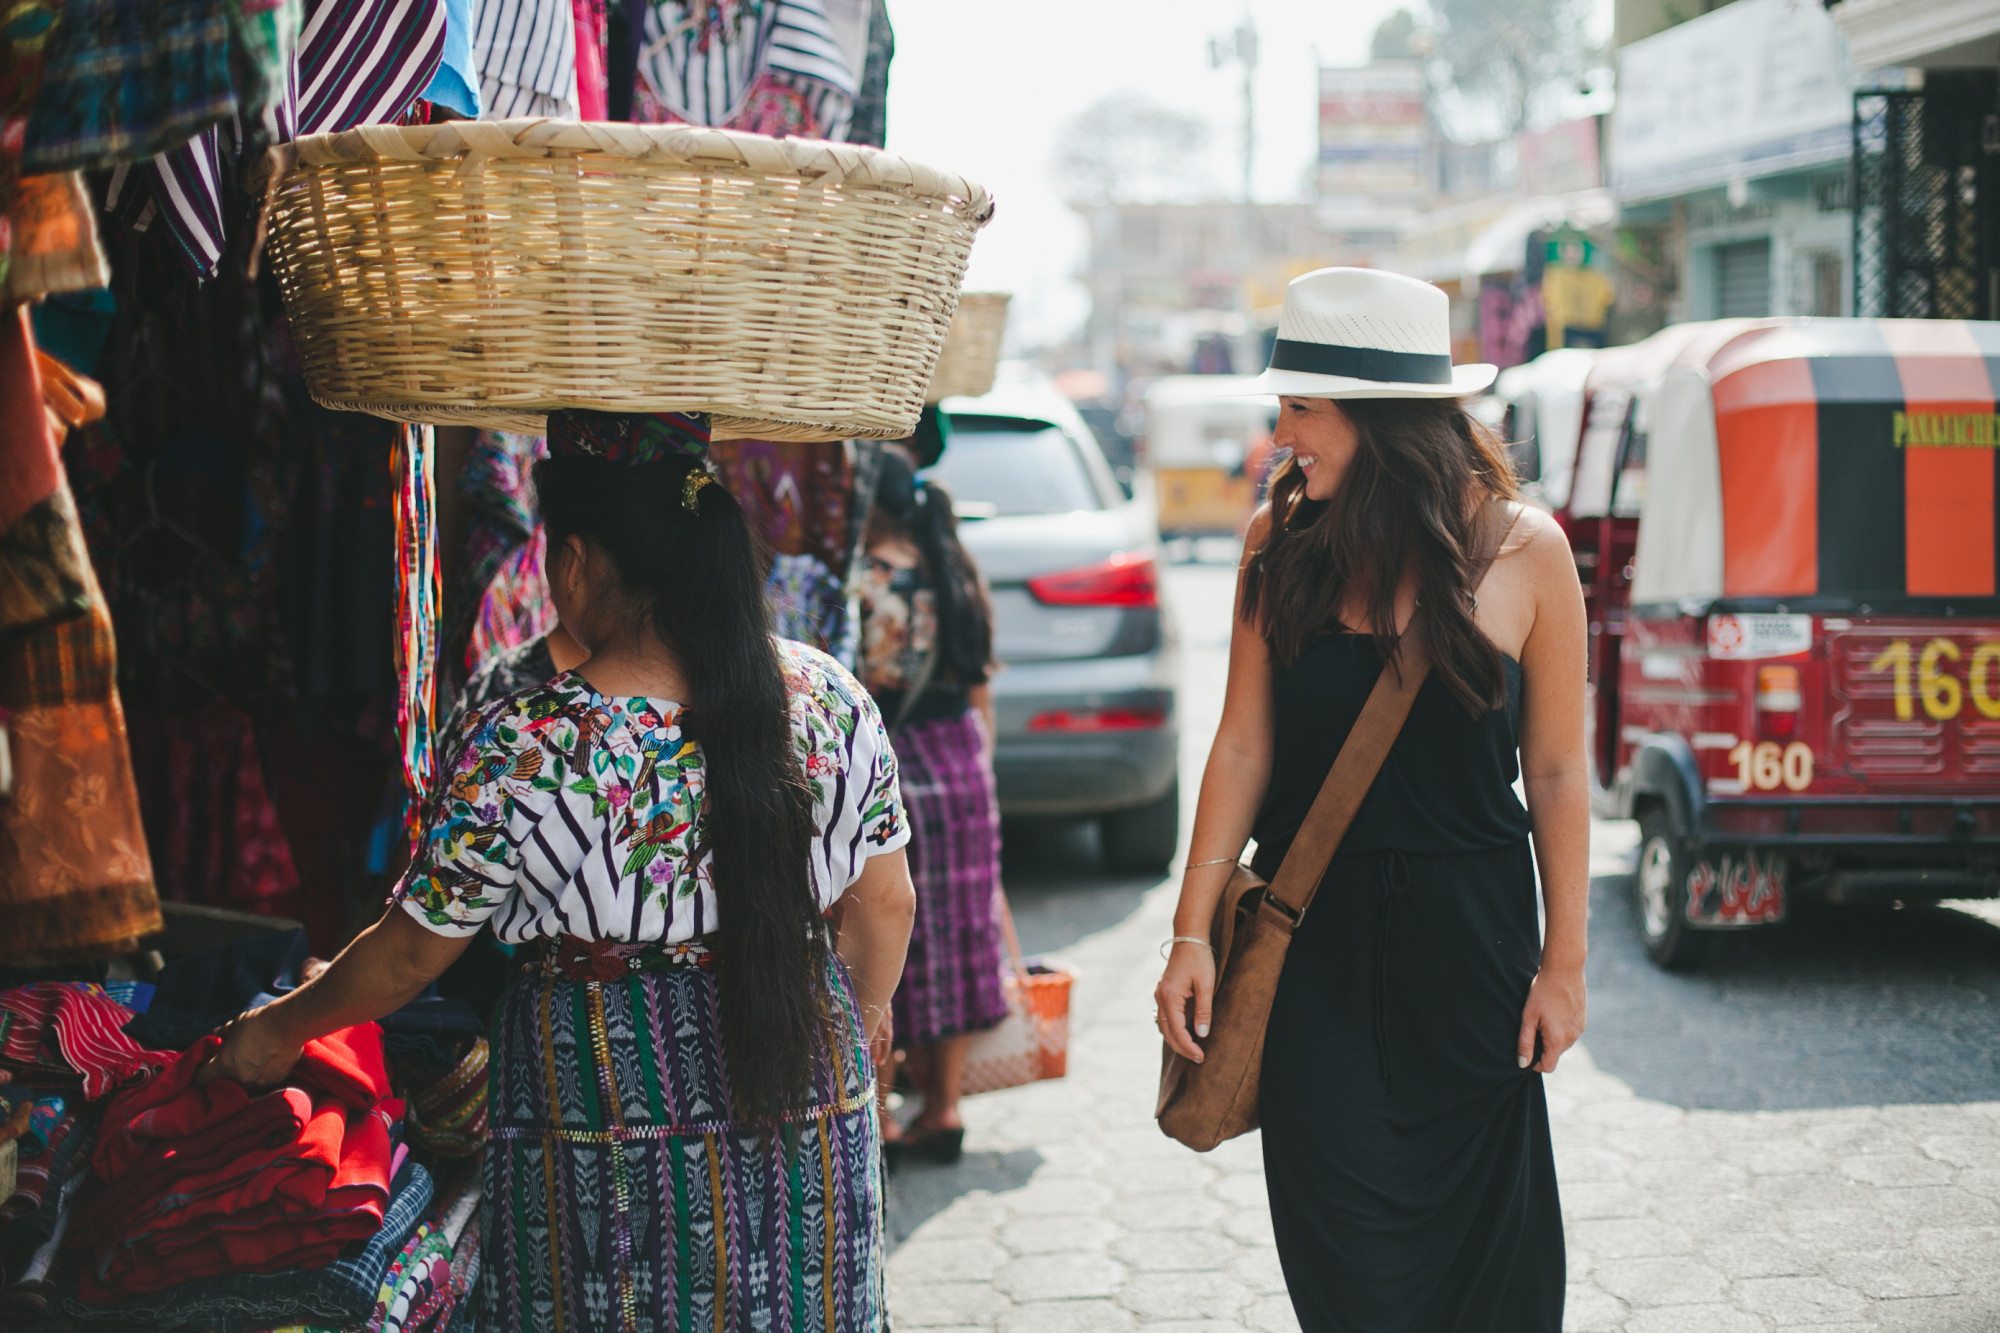 Shopping in Market2